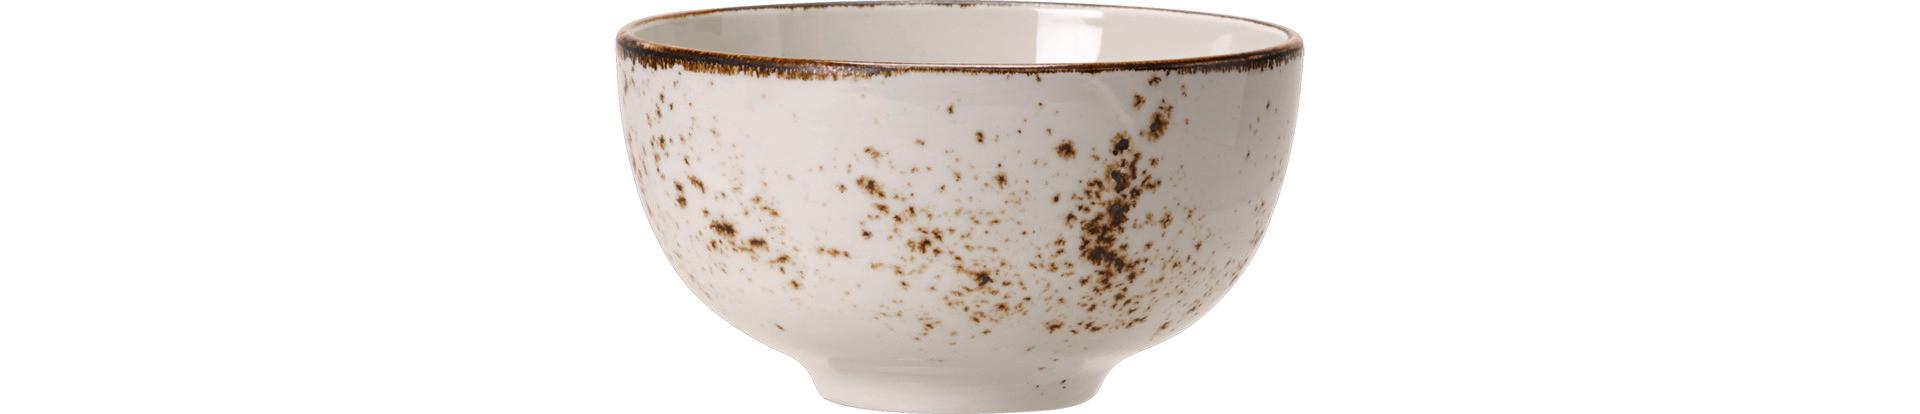 Craft White, Bowl ø 130 mm